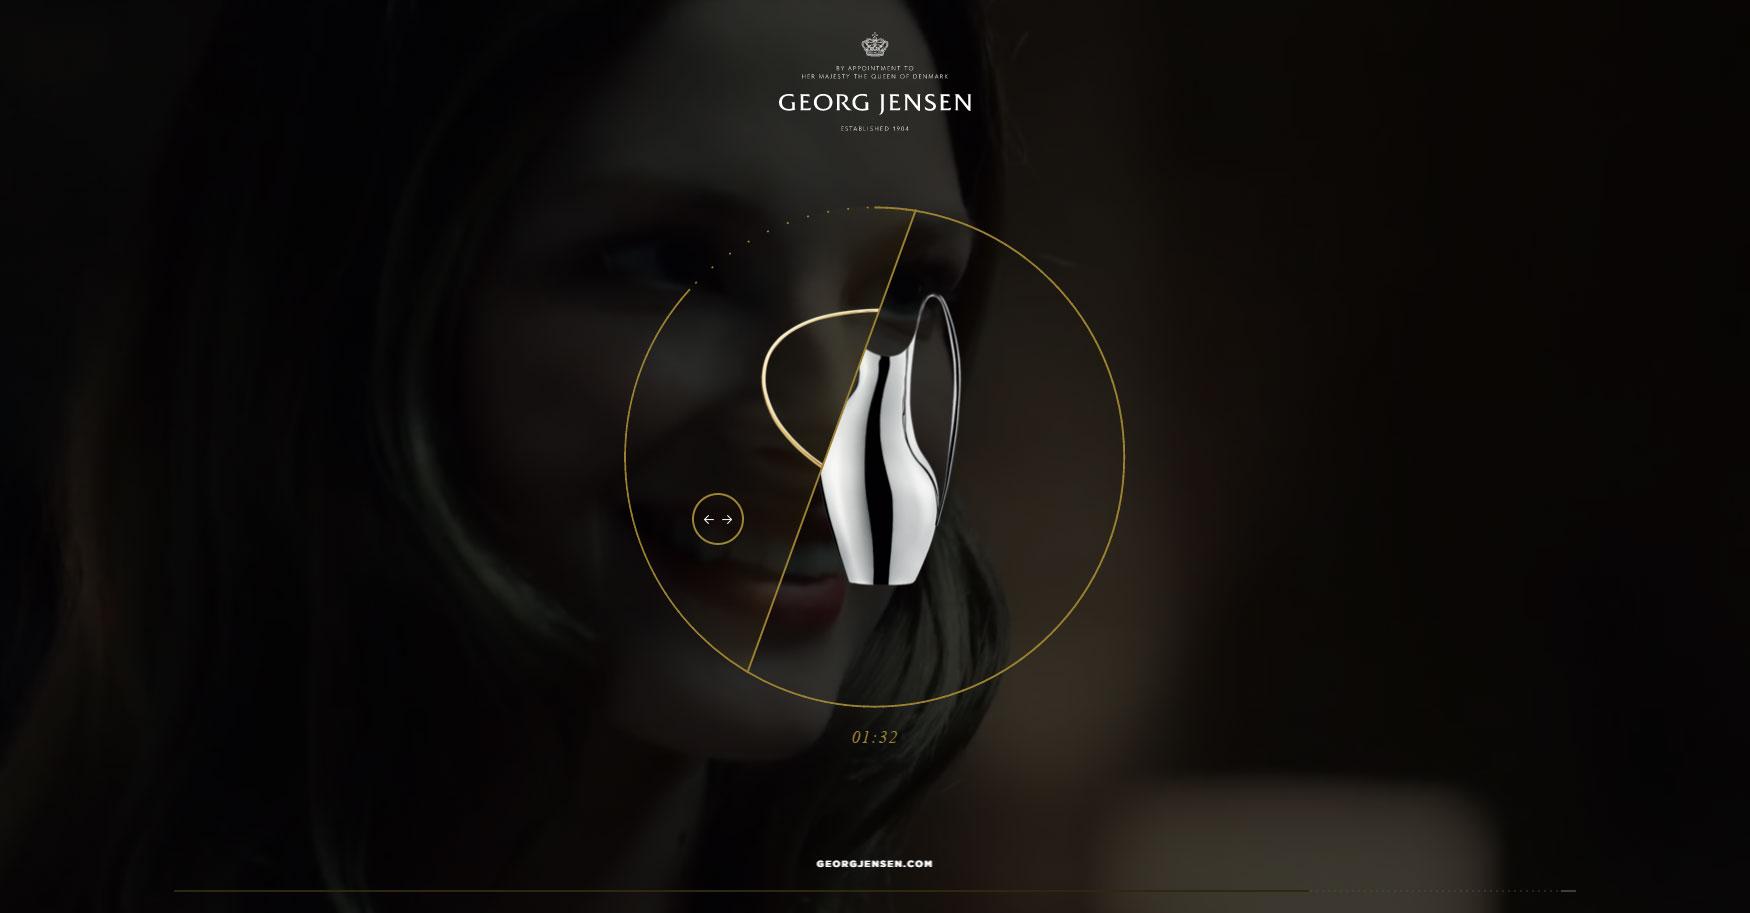 Georg Jensen - Website of the Month